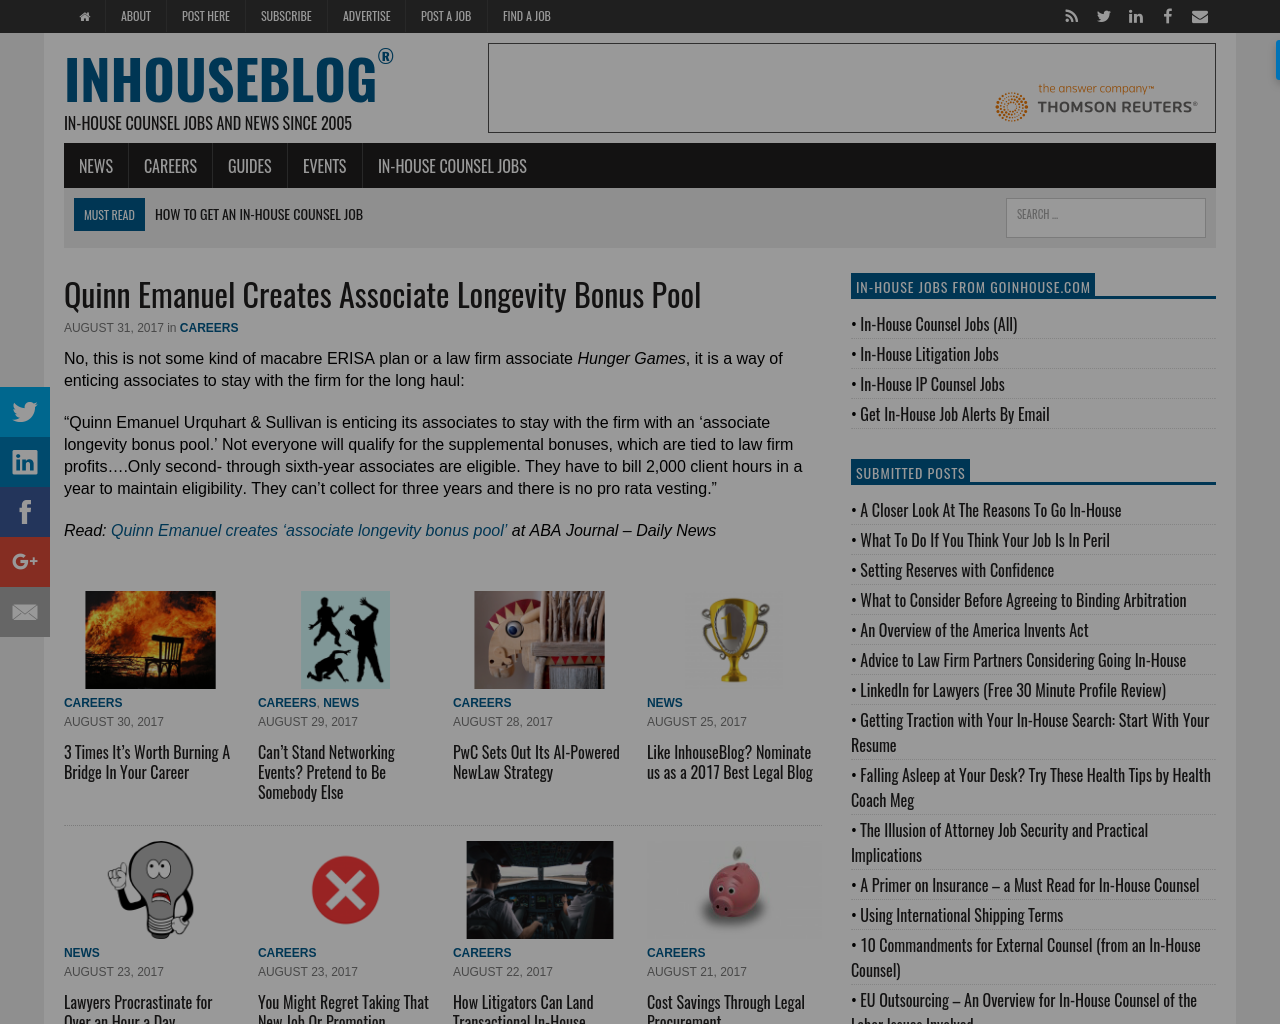 Inhouseblog-Advertising-Reviews-Pricing